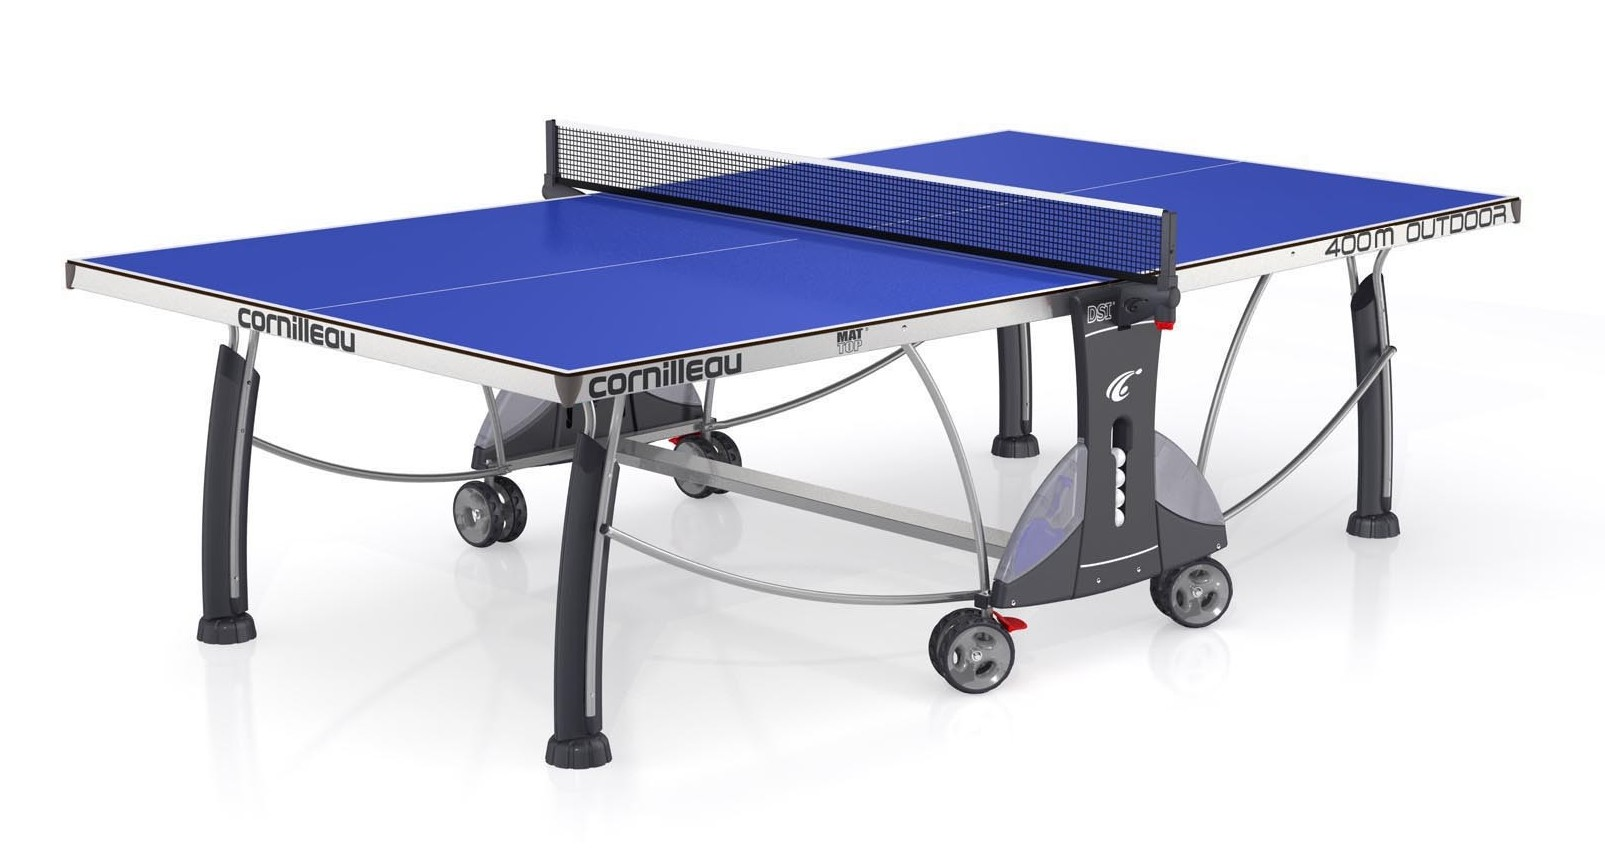 Pin cornilleau sport 400 rollaway indoor table tennis on - Table tennis de table cornilleau outdoor ...